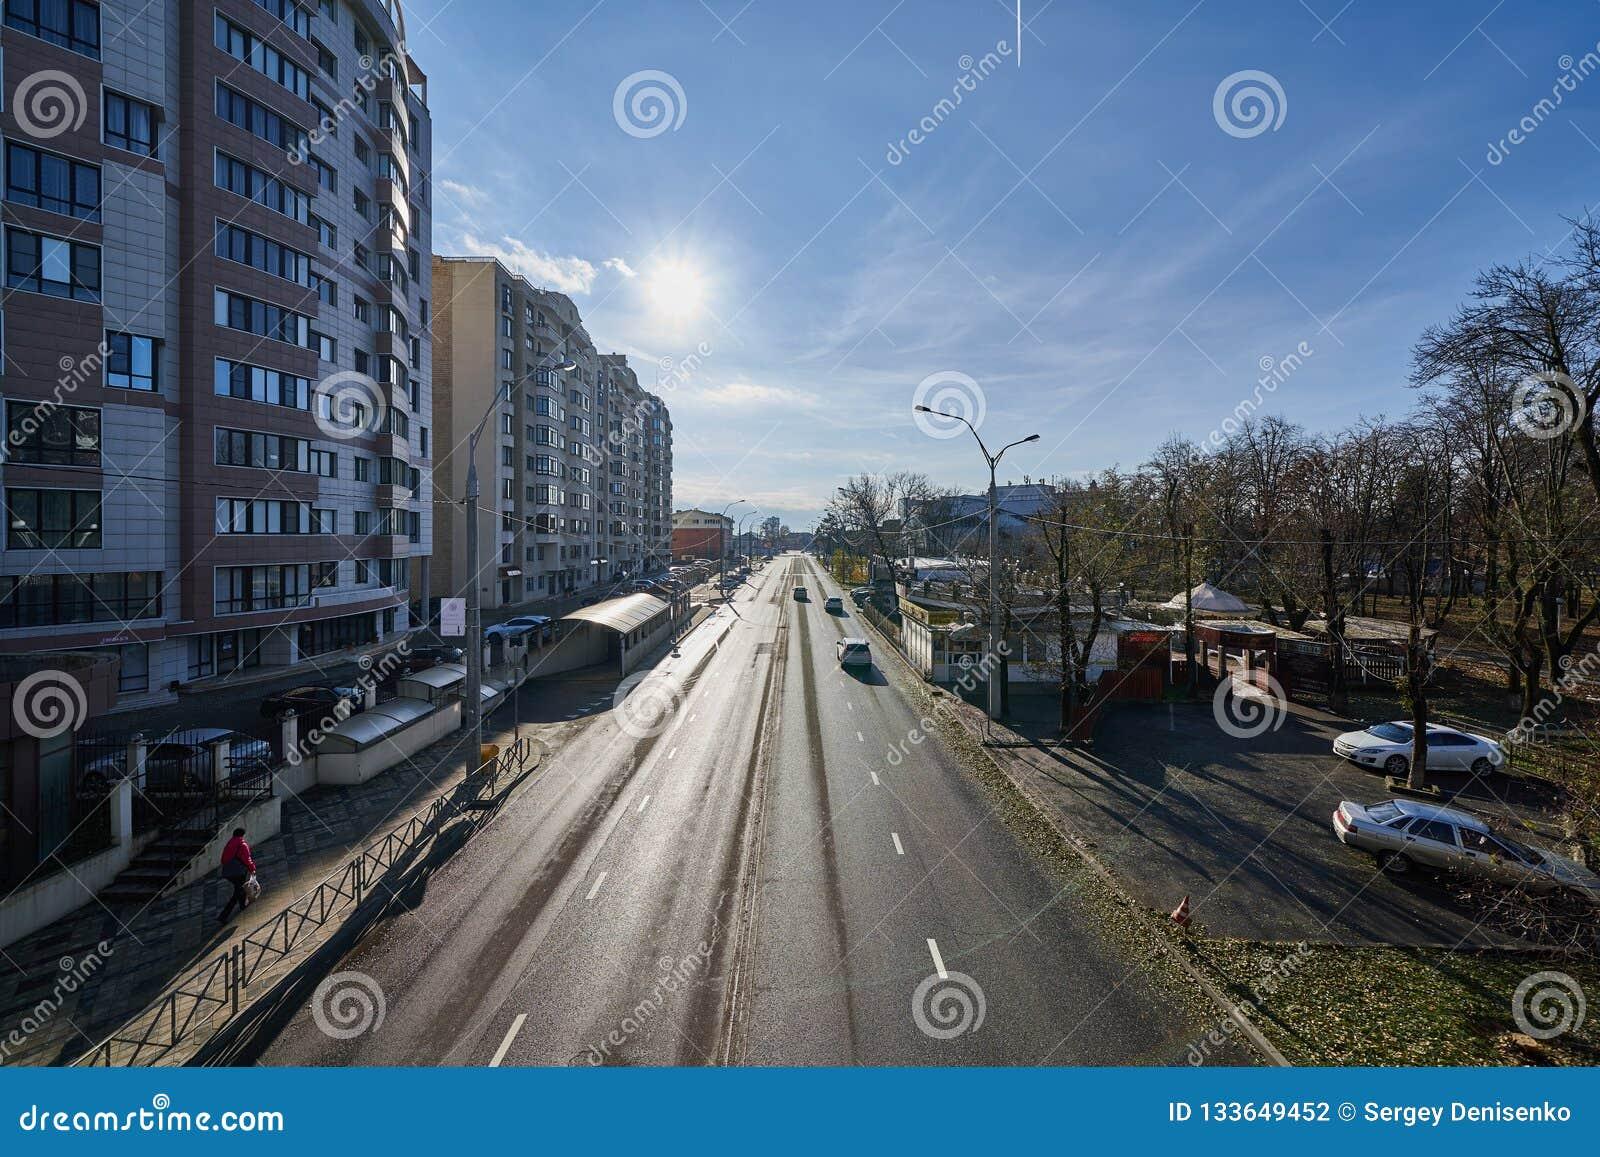 Krasnodar Kubanskaya Naberezhnaya Cityscape At The Beginning Of Winter Roads Buildings Cars Infrastructure Sunny Weather Editorial Photography Image Of Krasnodar District 133649452